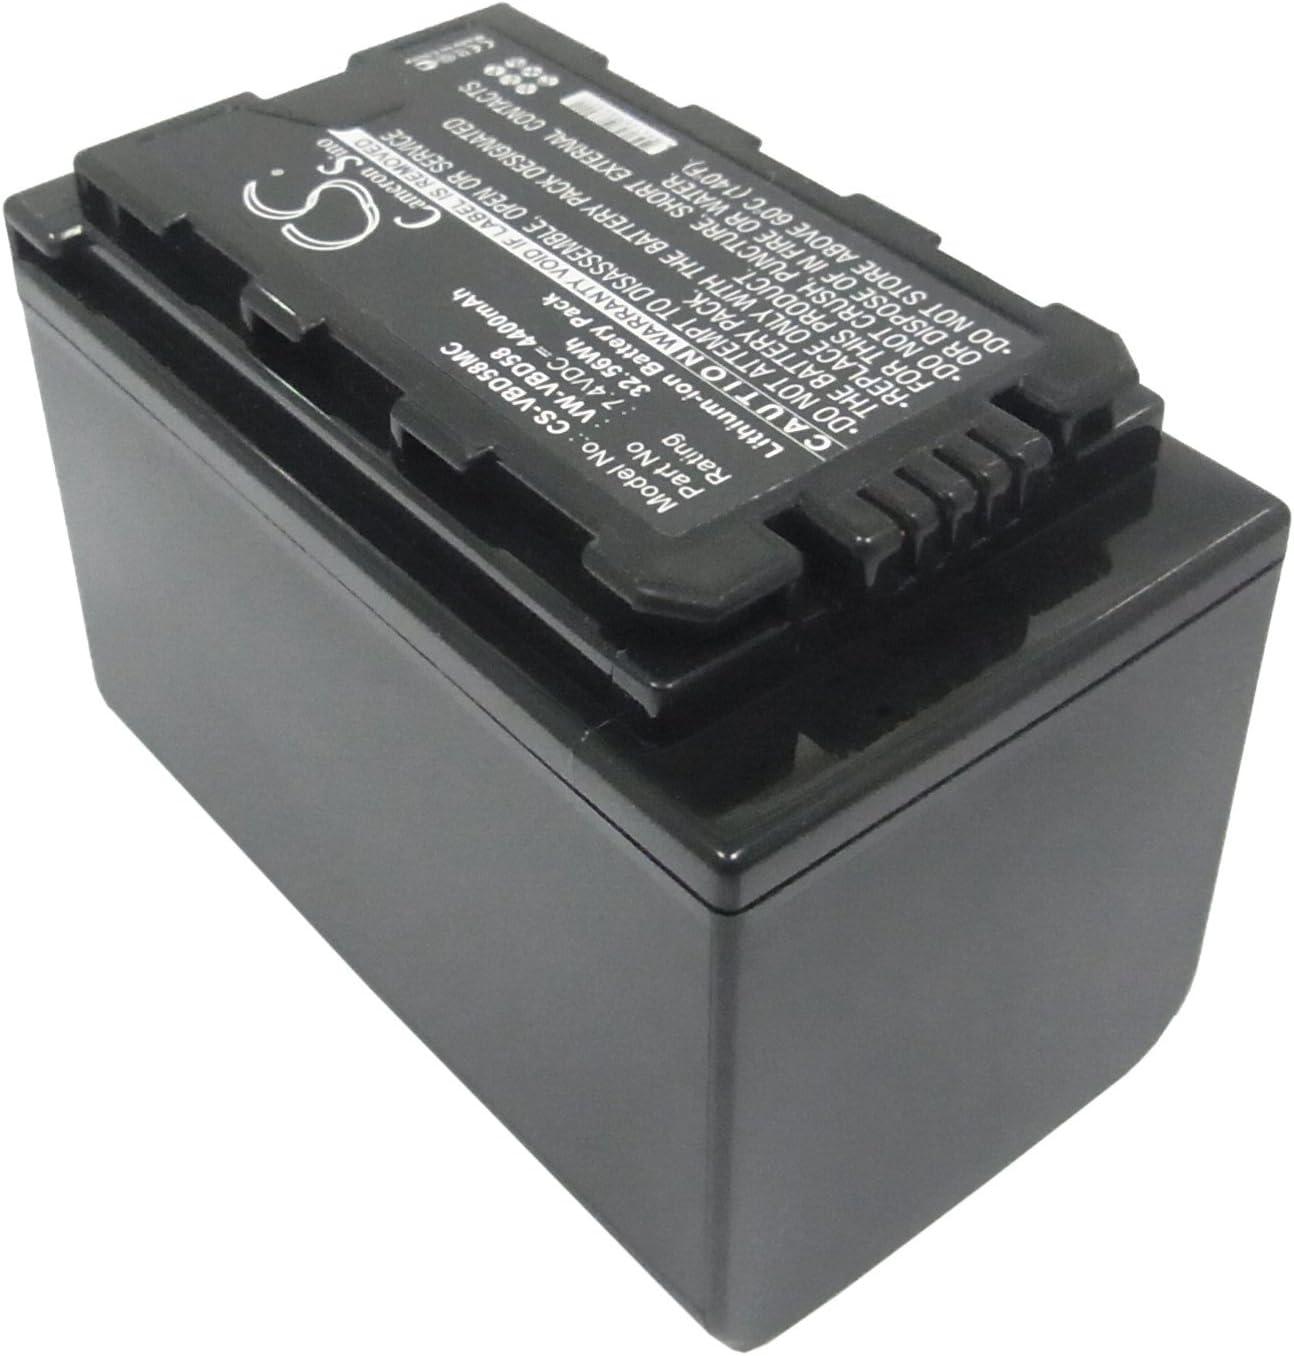 HDC-MDH2GK HC-MDH2 AJ-PX298MC HC-MDH2M HC-MDH2GK-K AJ-PX298 Cameron-Sino CS Spare Battery for Panasonic Camera AJ-PX270 HC-MDH2GK